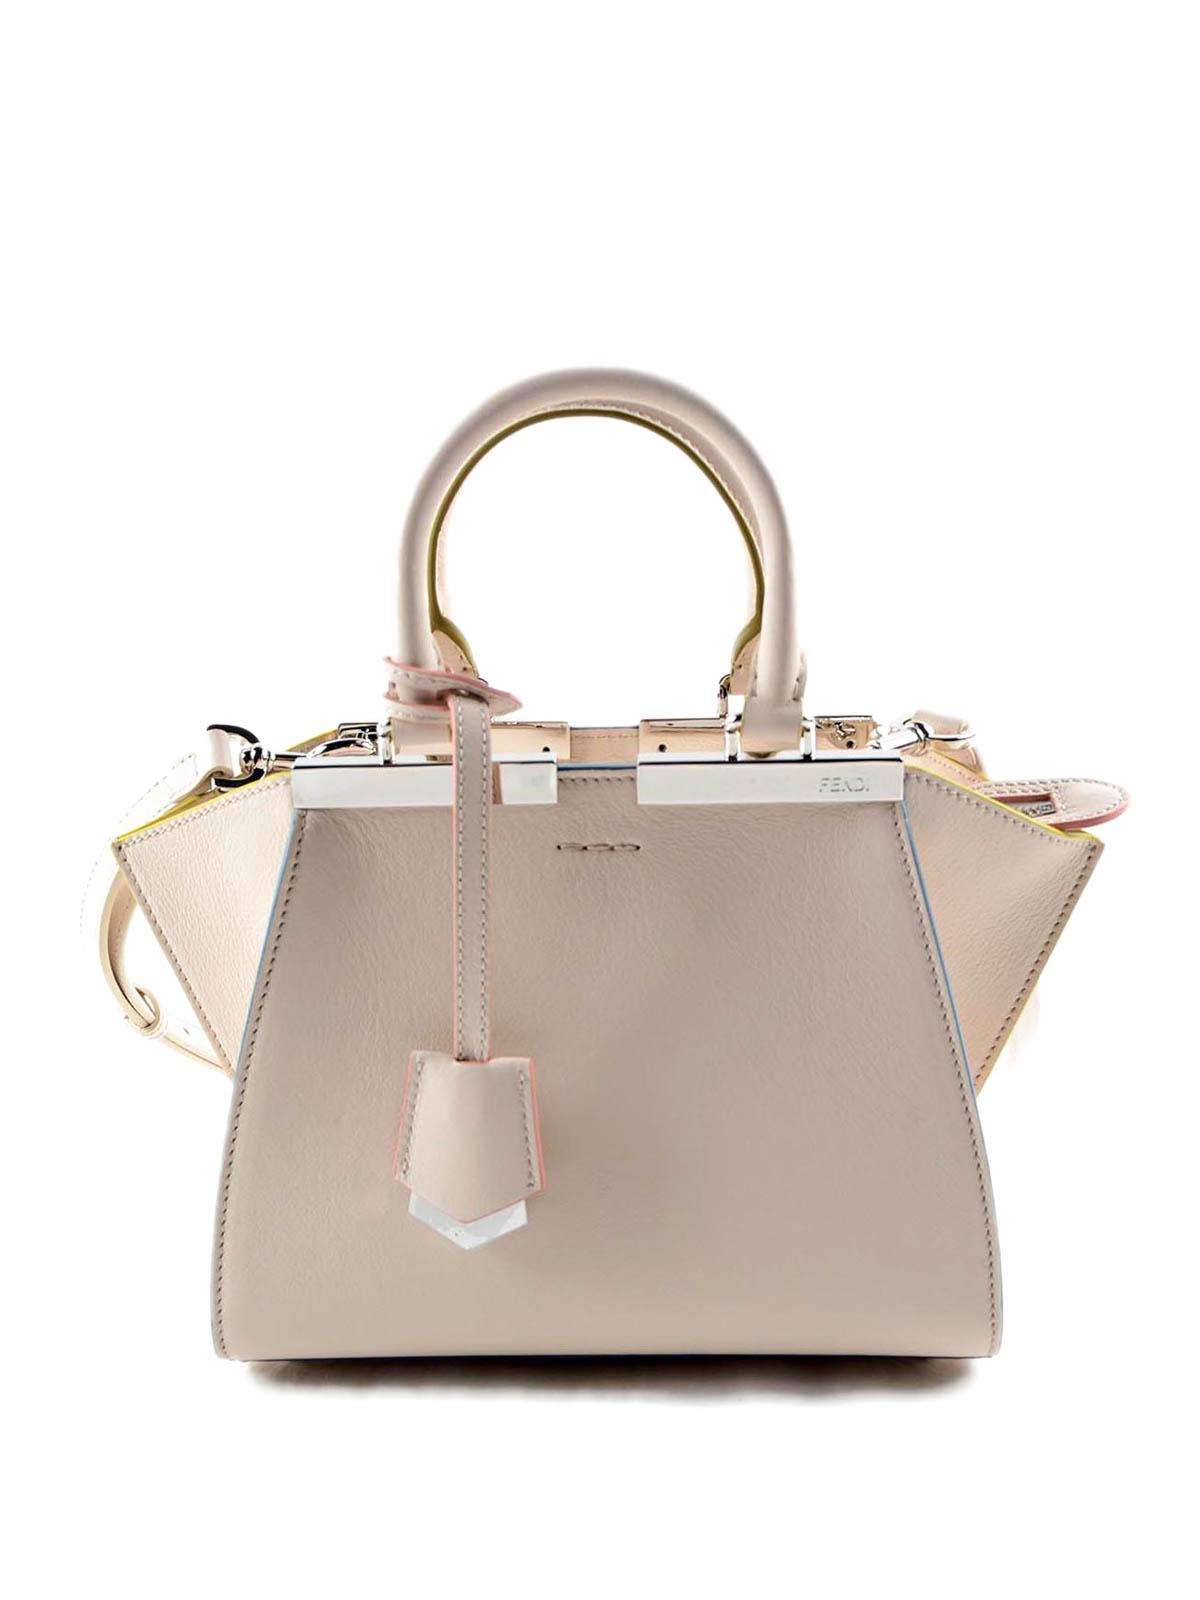 d01acb711eac Fendi - Mini 3Jours bag - cross body bags - 8BH3335QTMU3